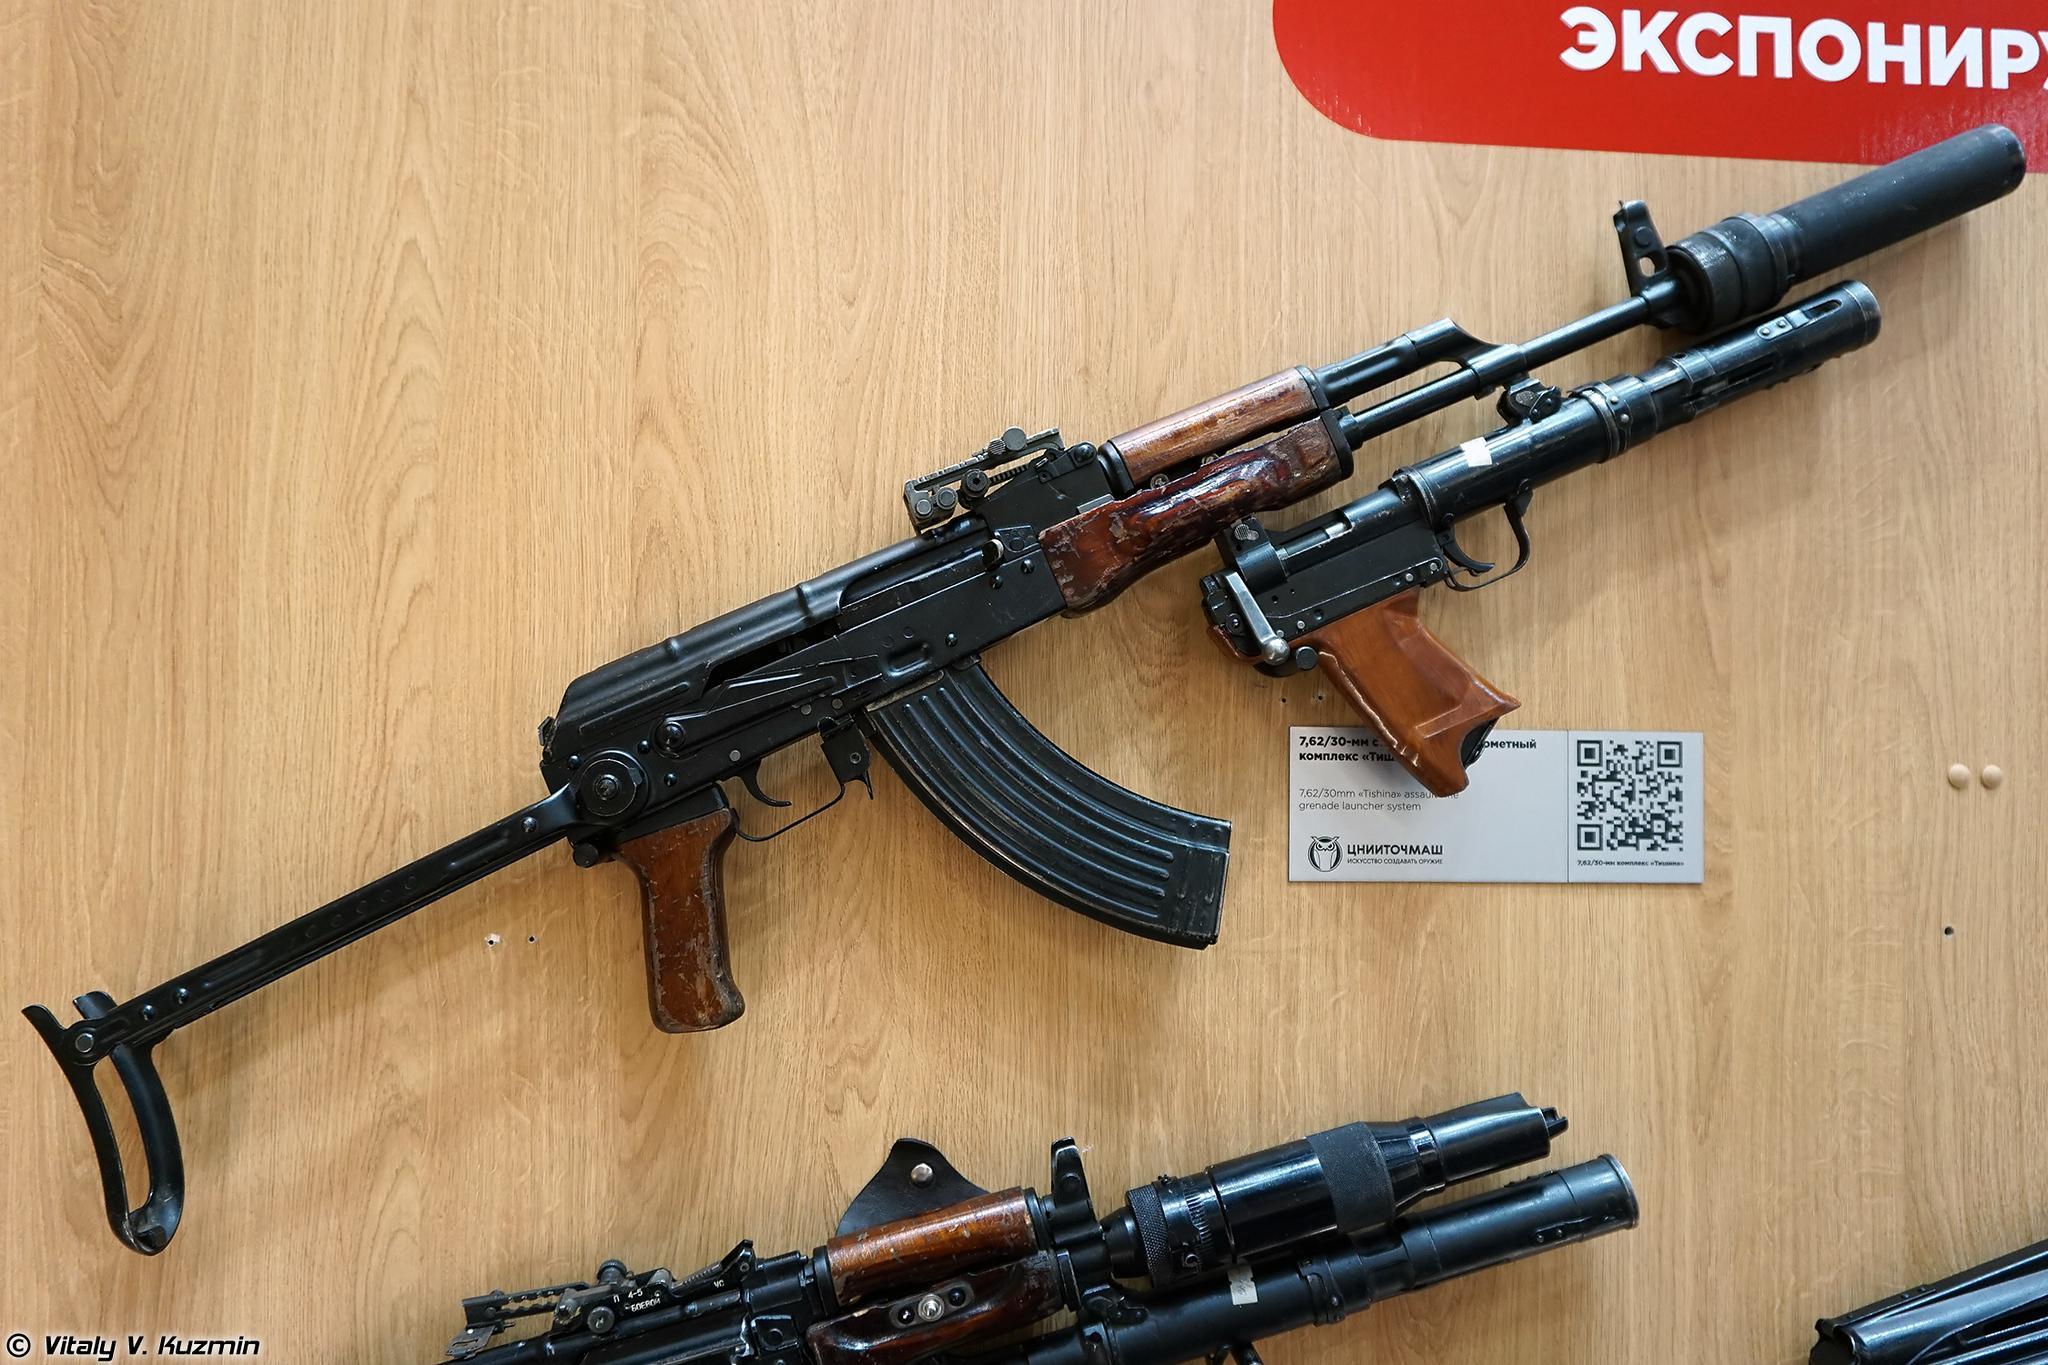 Russian Assault Rifles/Carbines/Machine Guns Thread: #2 - Page 10 Army-2020-Pavilions-043-X4